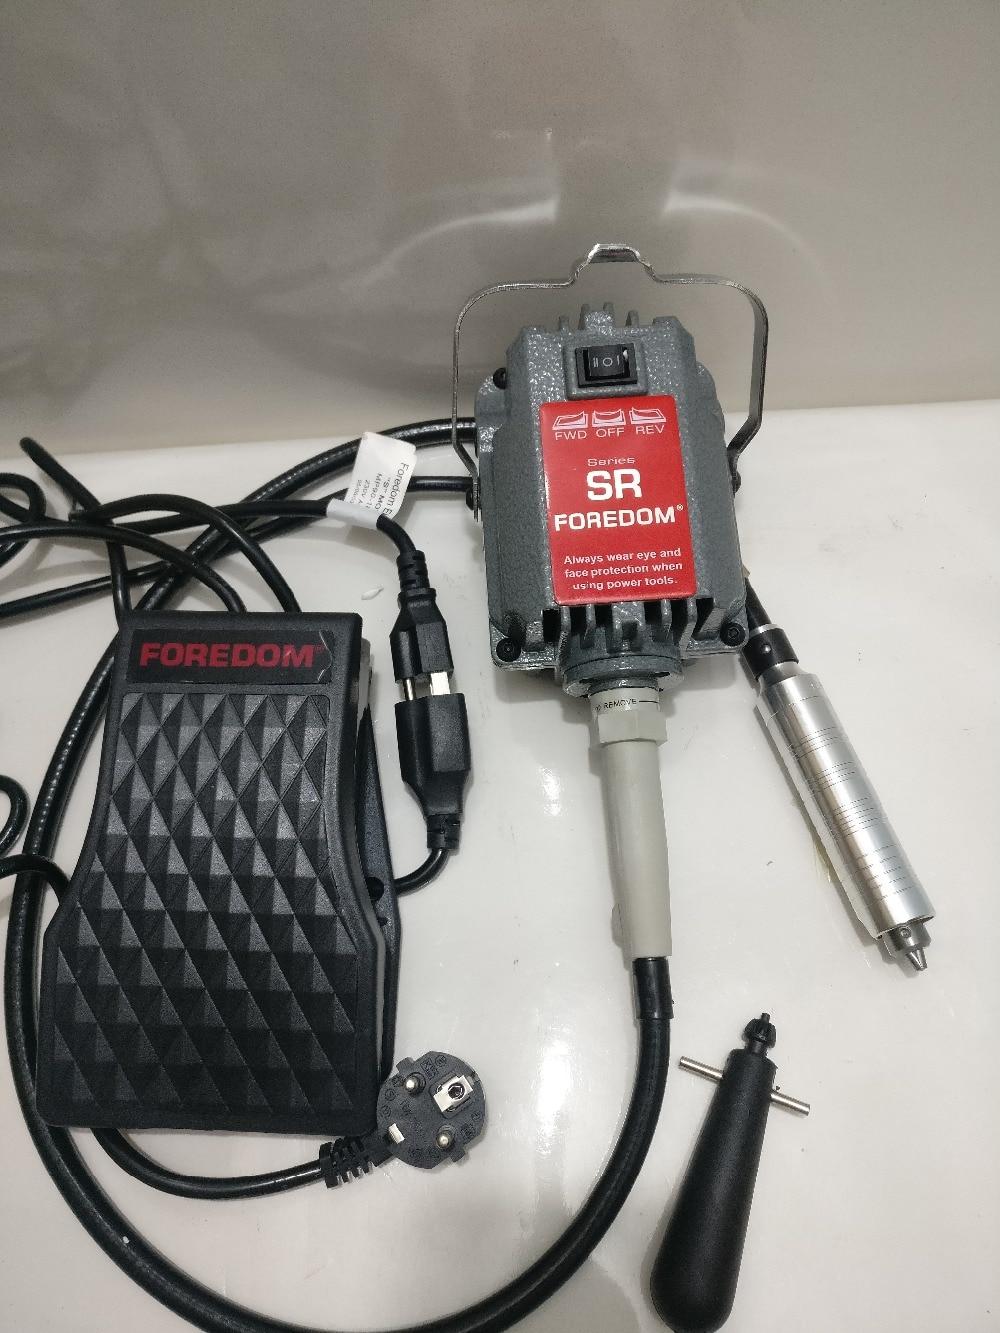 Foredom SR flexshaft machine,dental polishing motor,flexible shaft machine,watch engraving burnishing grinding rotary tool kit